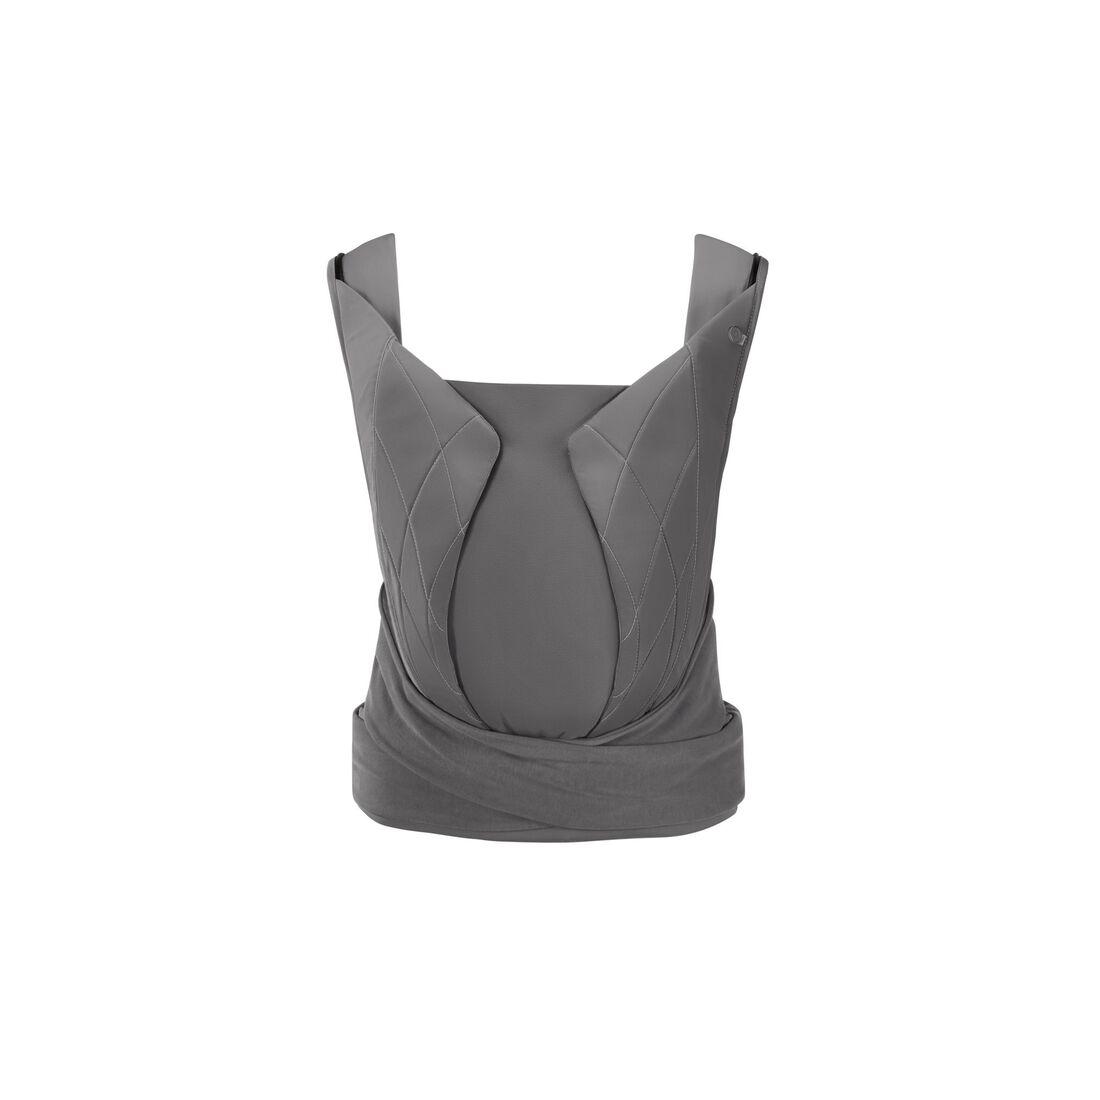 CYBEX Yema Tie - Soho Grey in Soho Grey large Bild 1